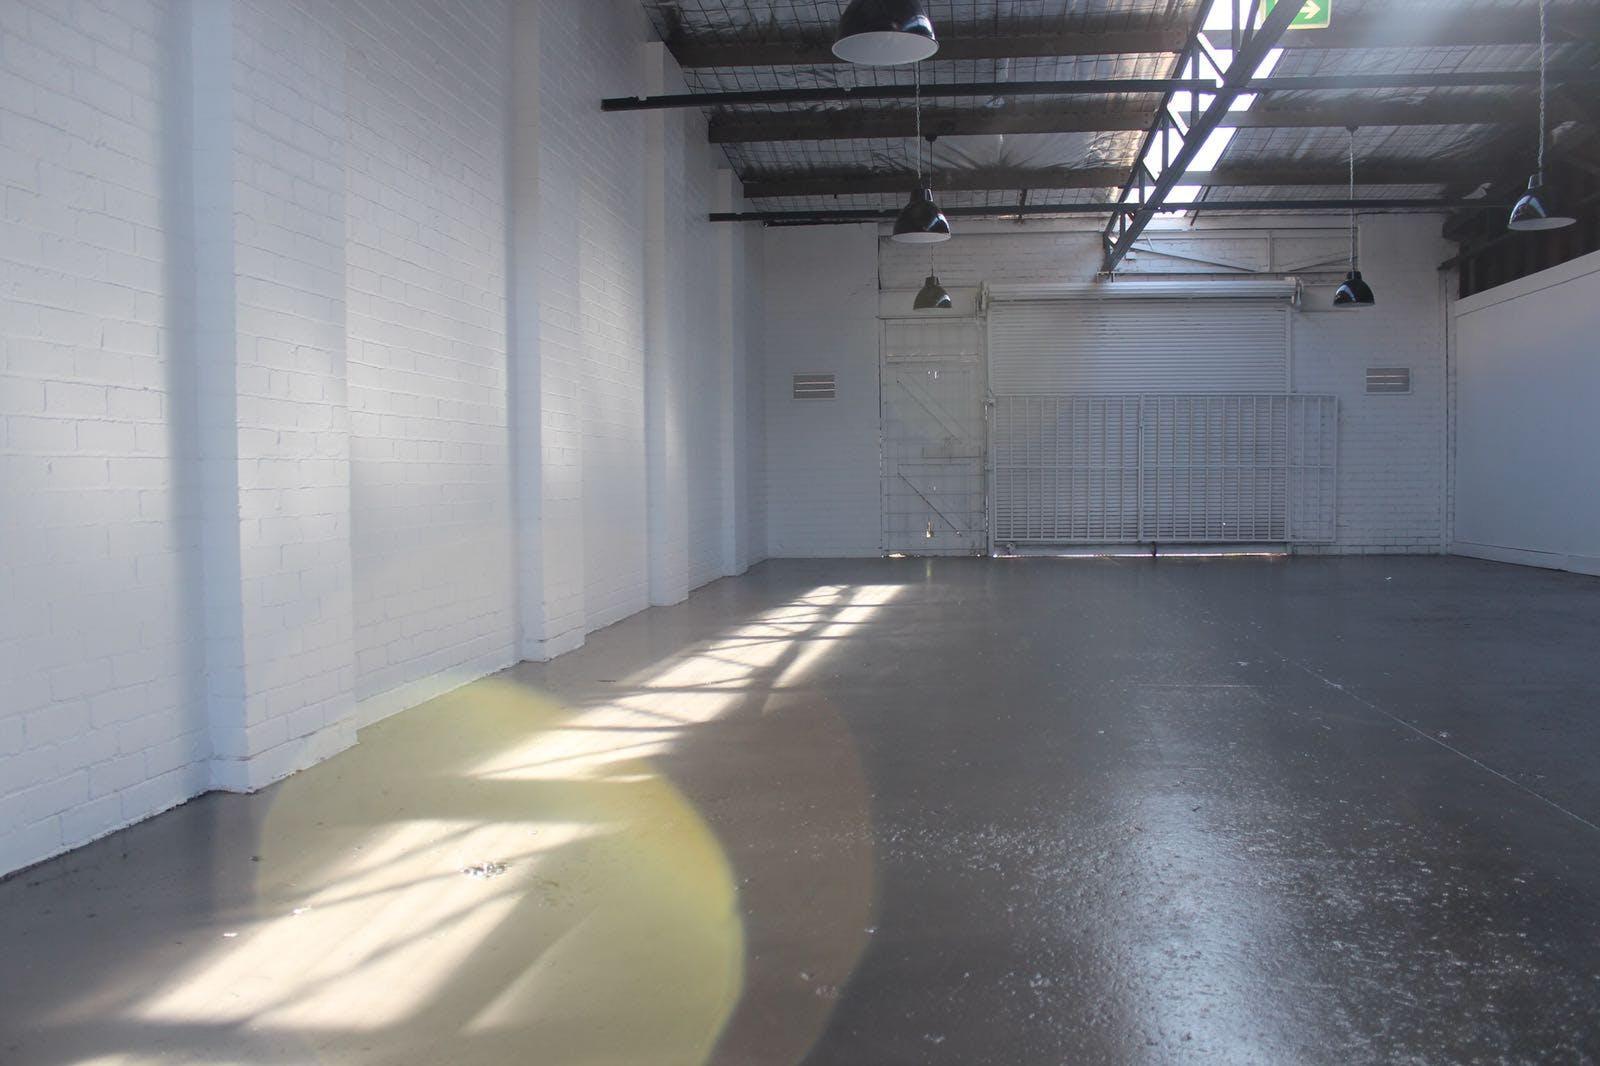 MARKET ROOM, multi-use area at 10 Balcombe, image 5